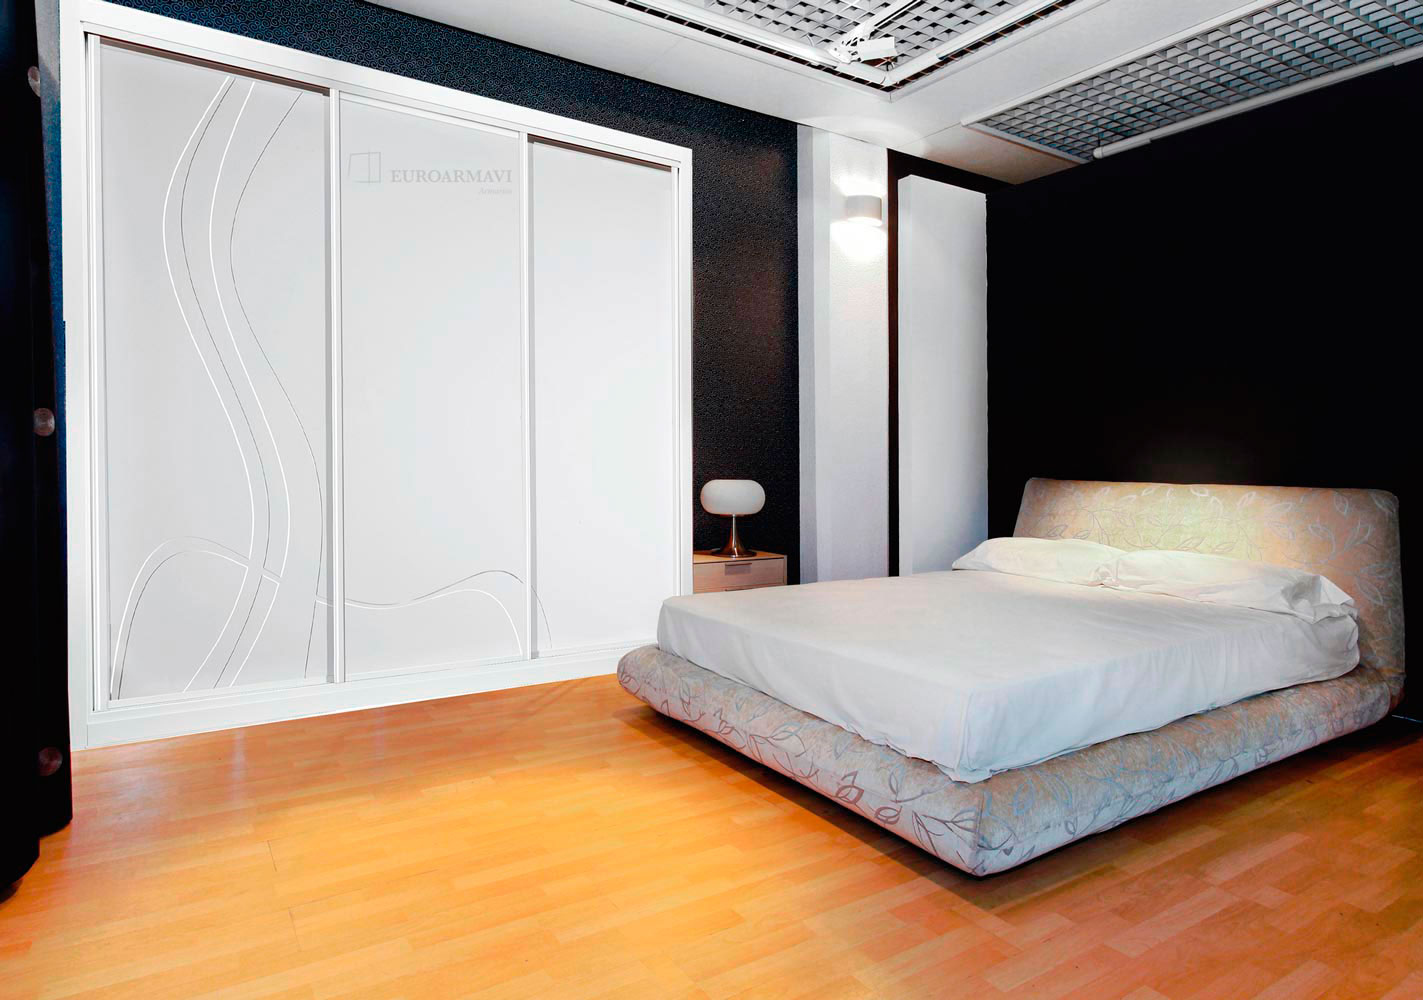 Modelos de armarios empotrados para dormitorios armarios for Puertas de dormitorios modelos